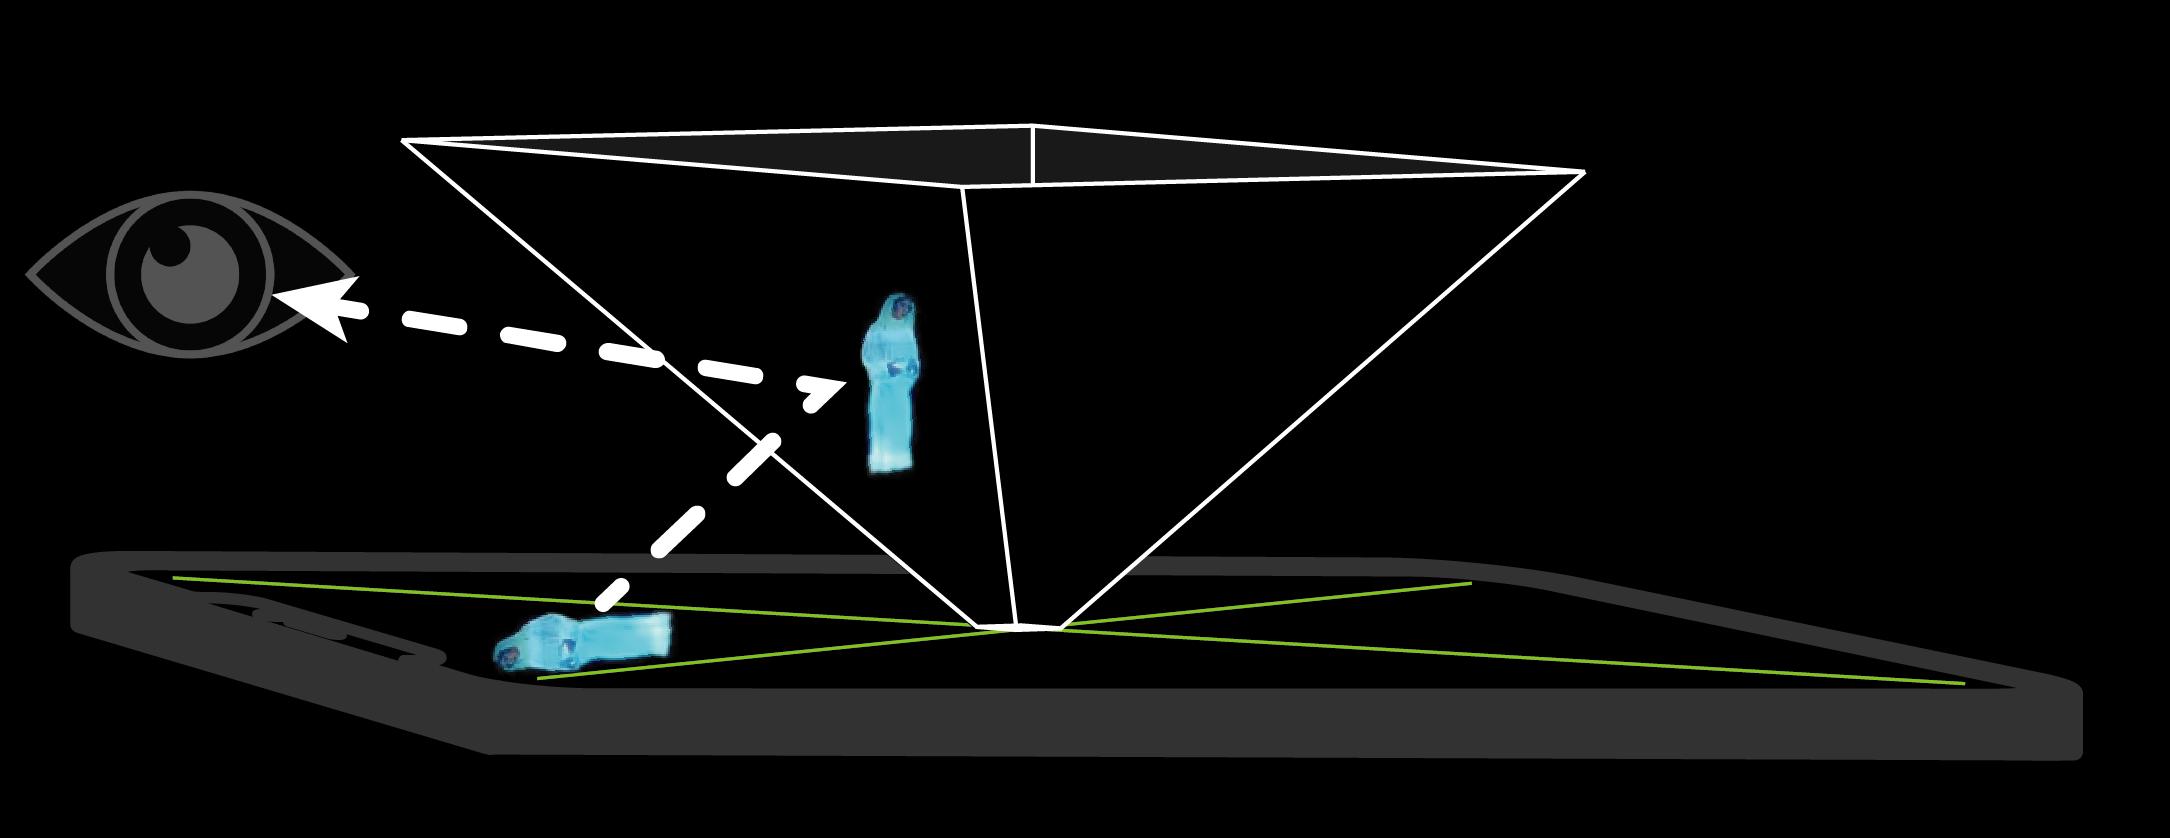 Holoplanation: Hologram Prisms explained